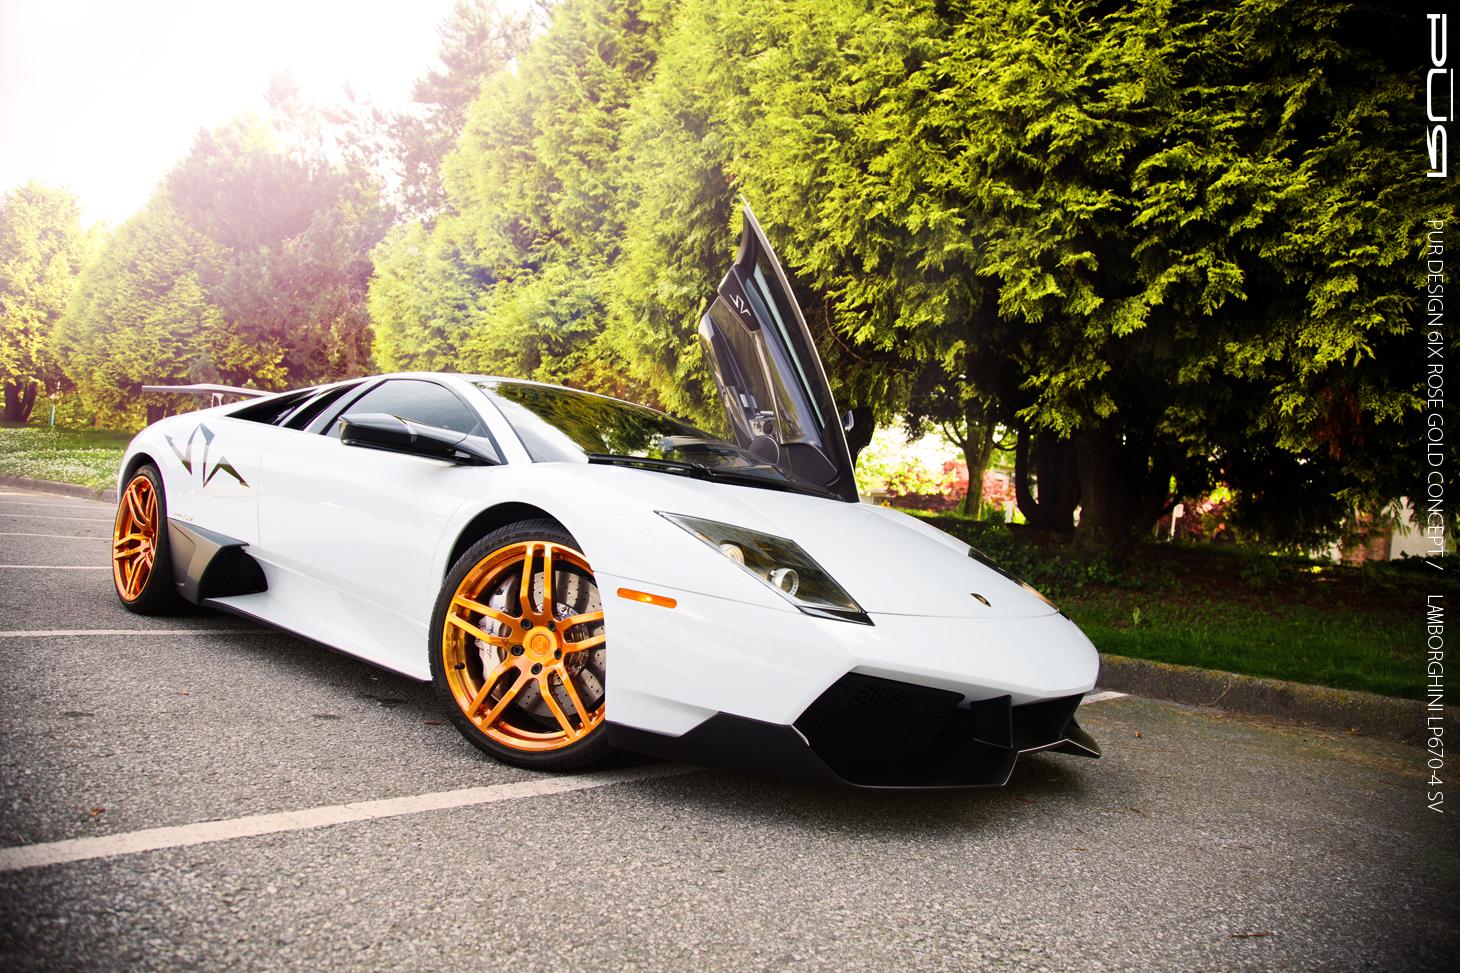 The Golden Renaissance Project Sr Auto Lamborghini